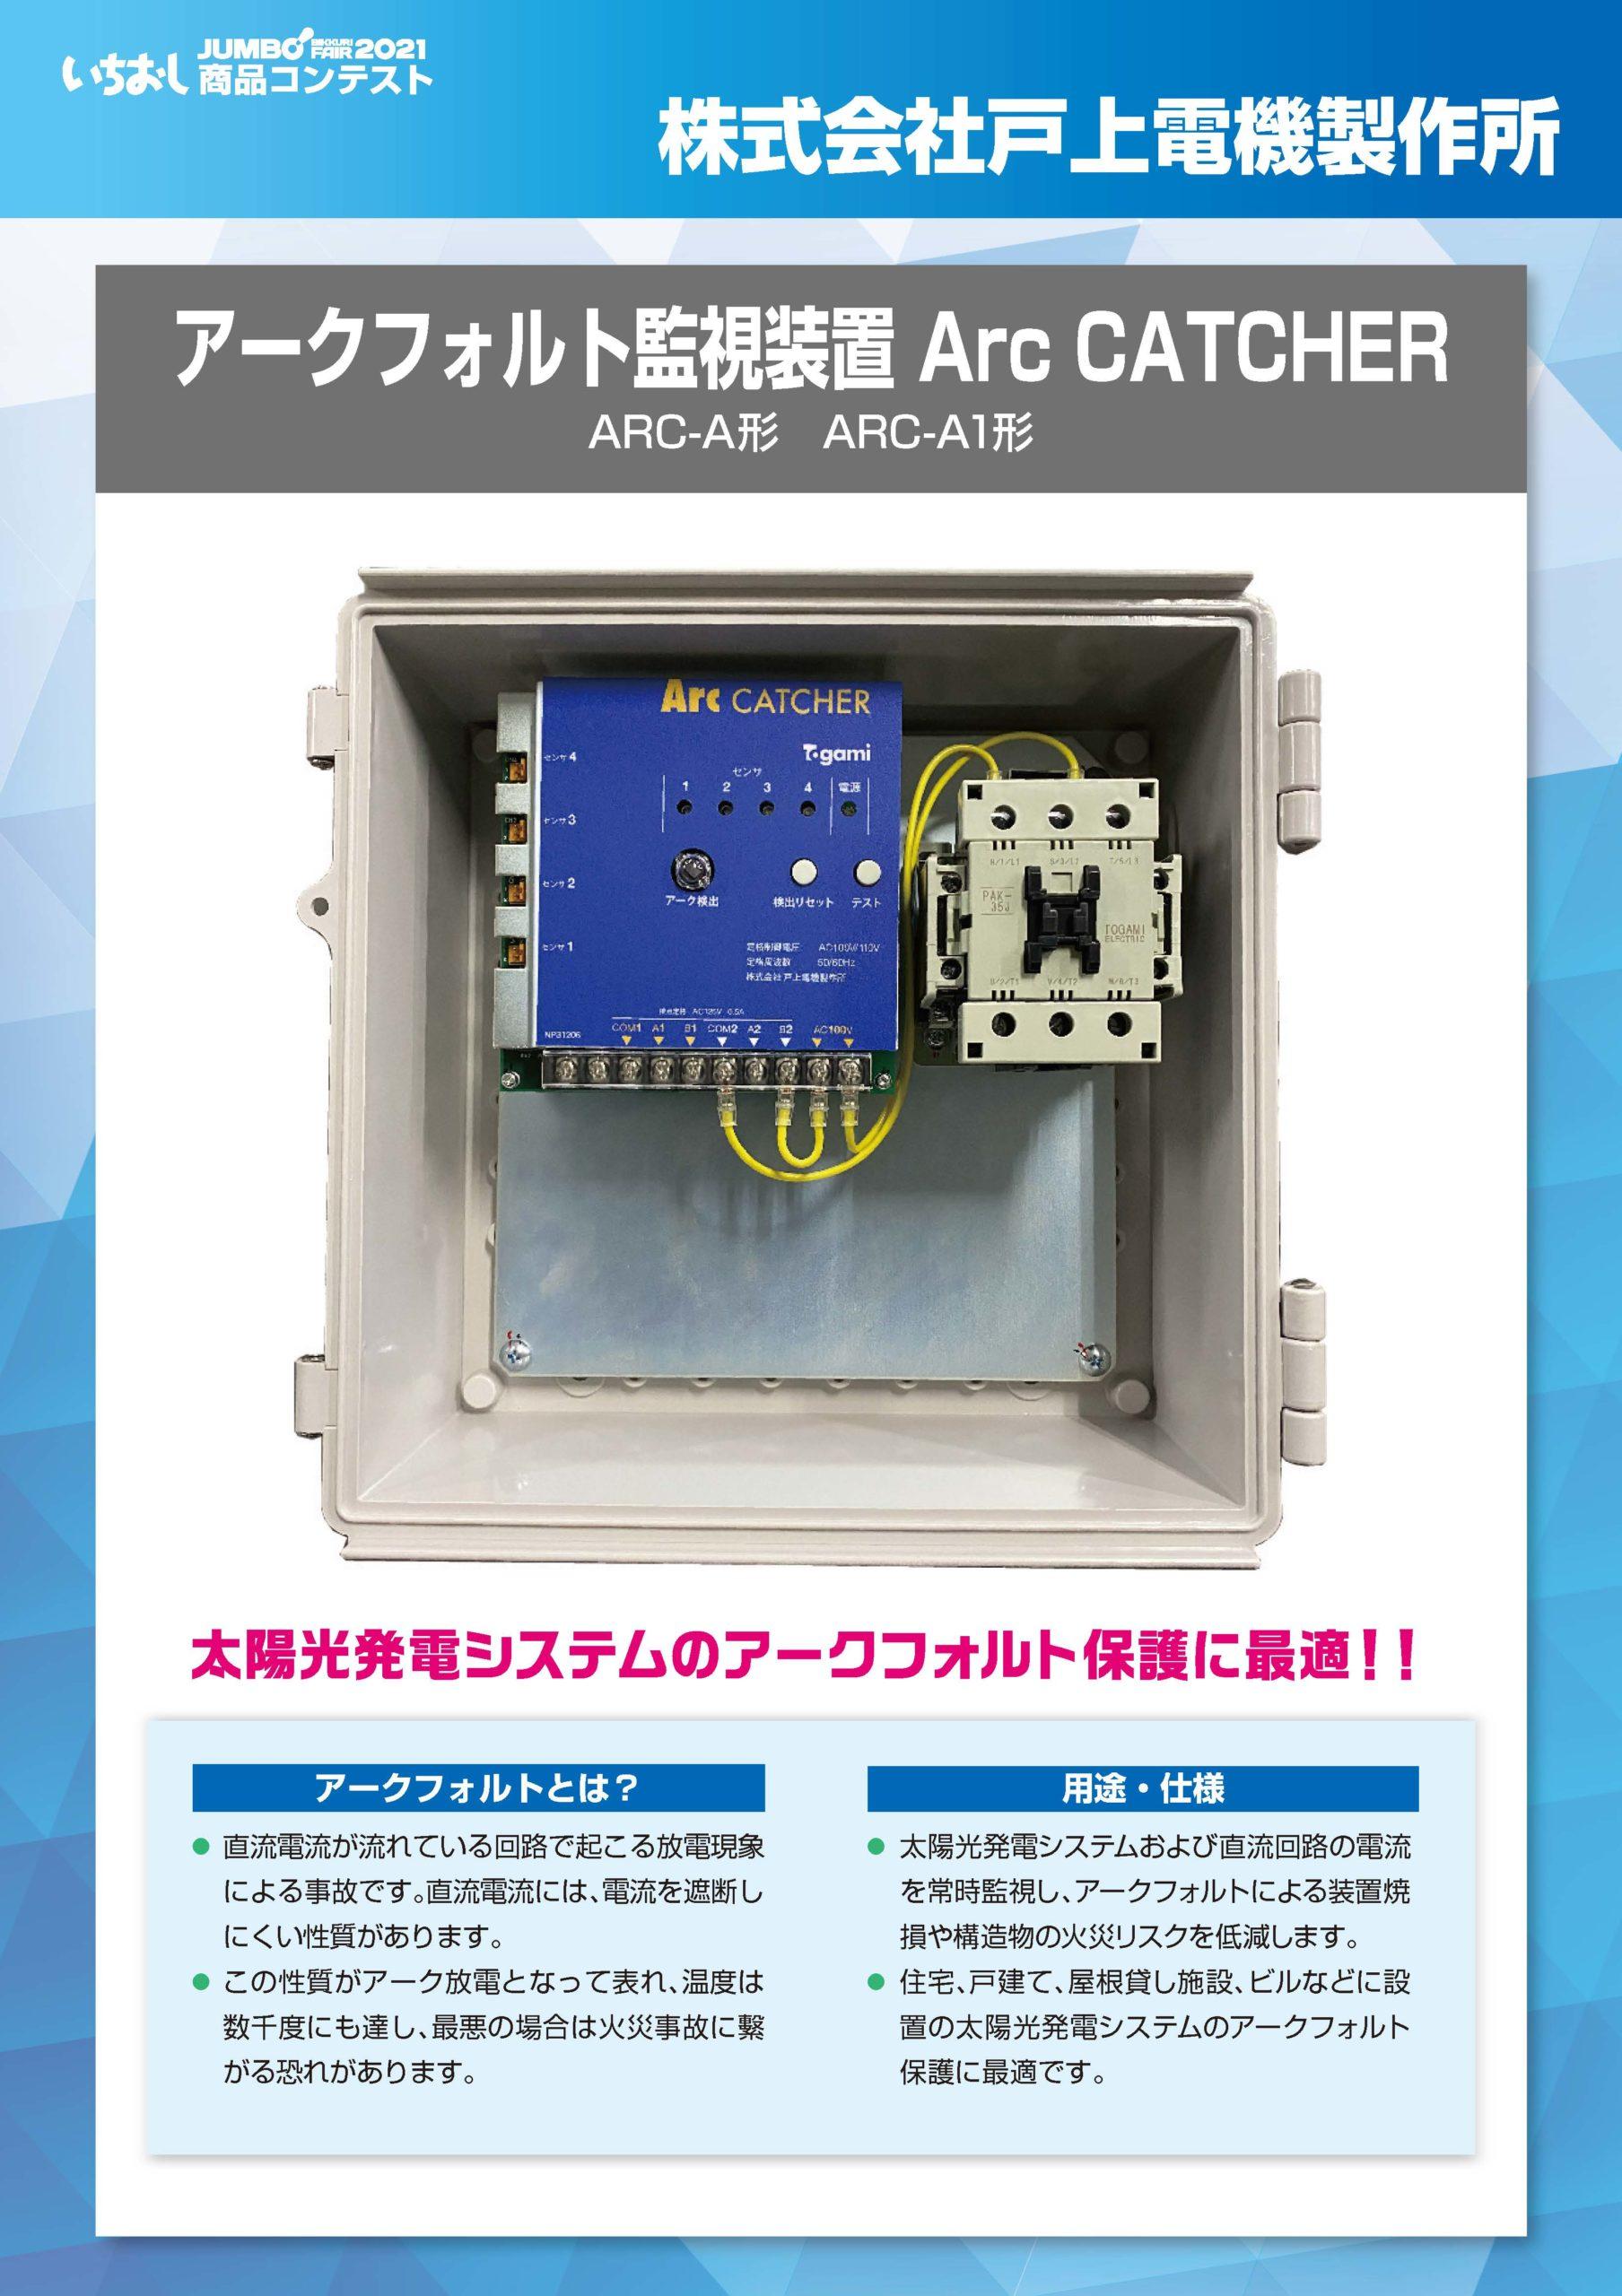 「アークフォルト監視装置 Arc CATCHER」株式会社戸上電機製作所の画像